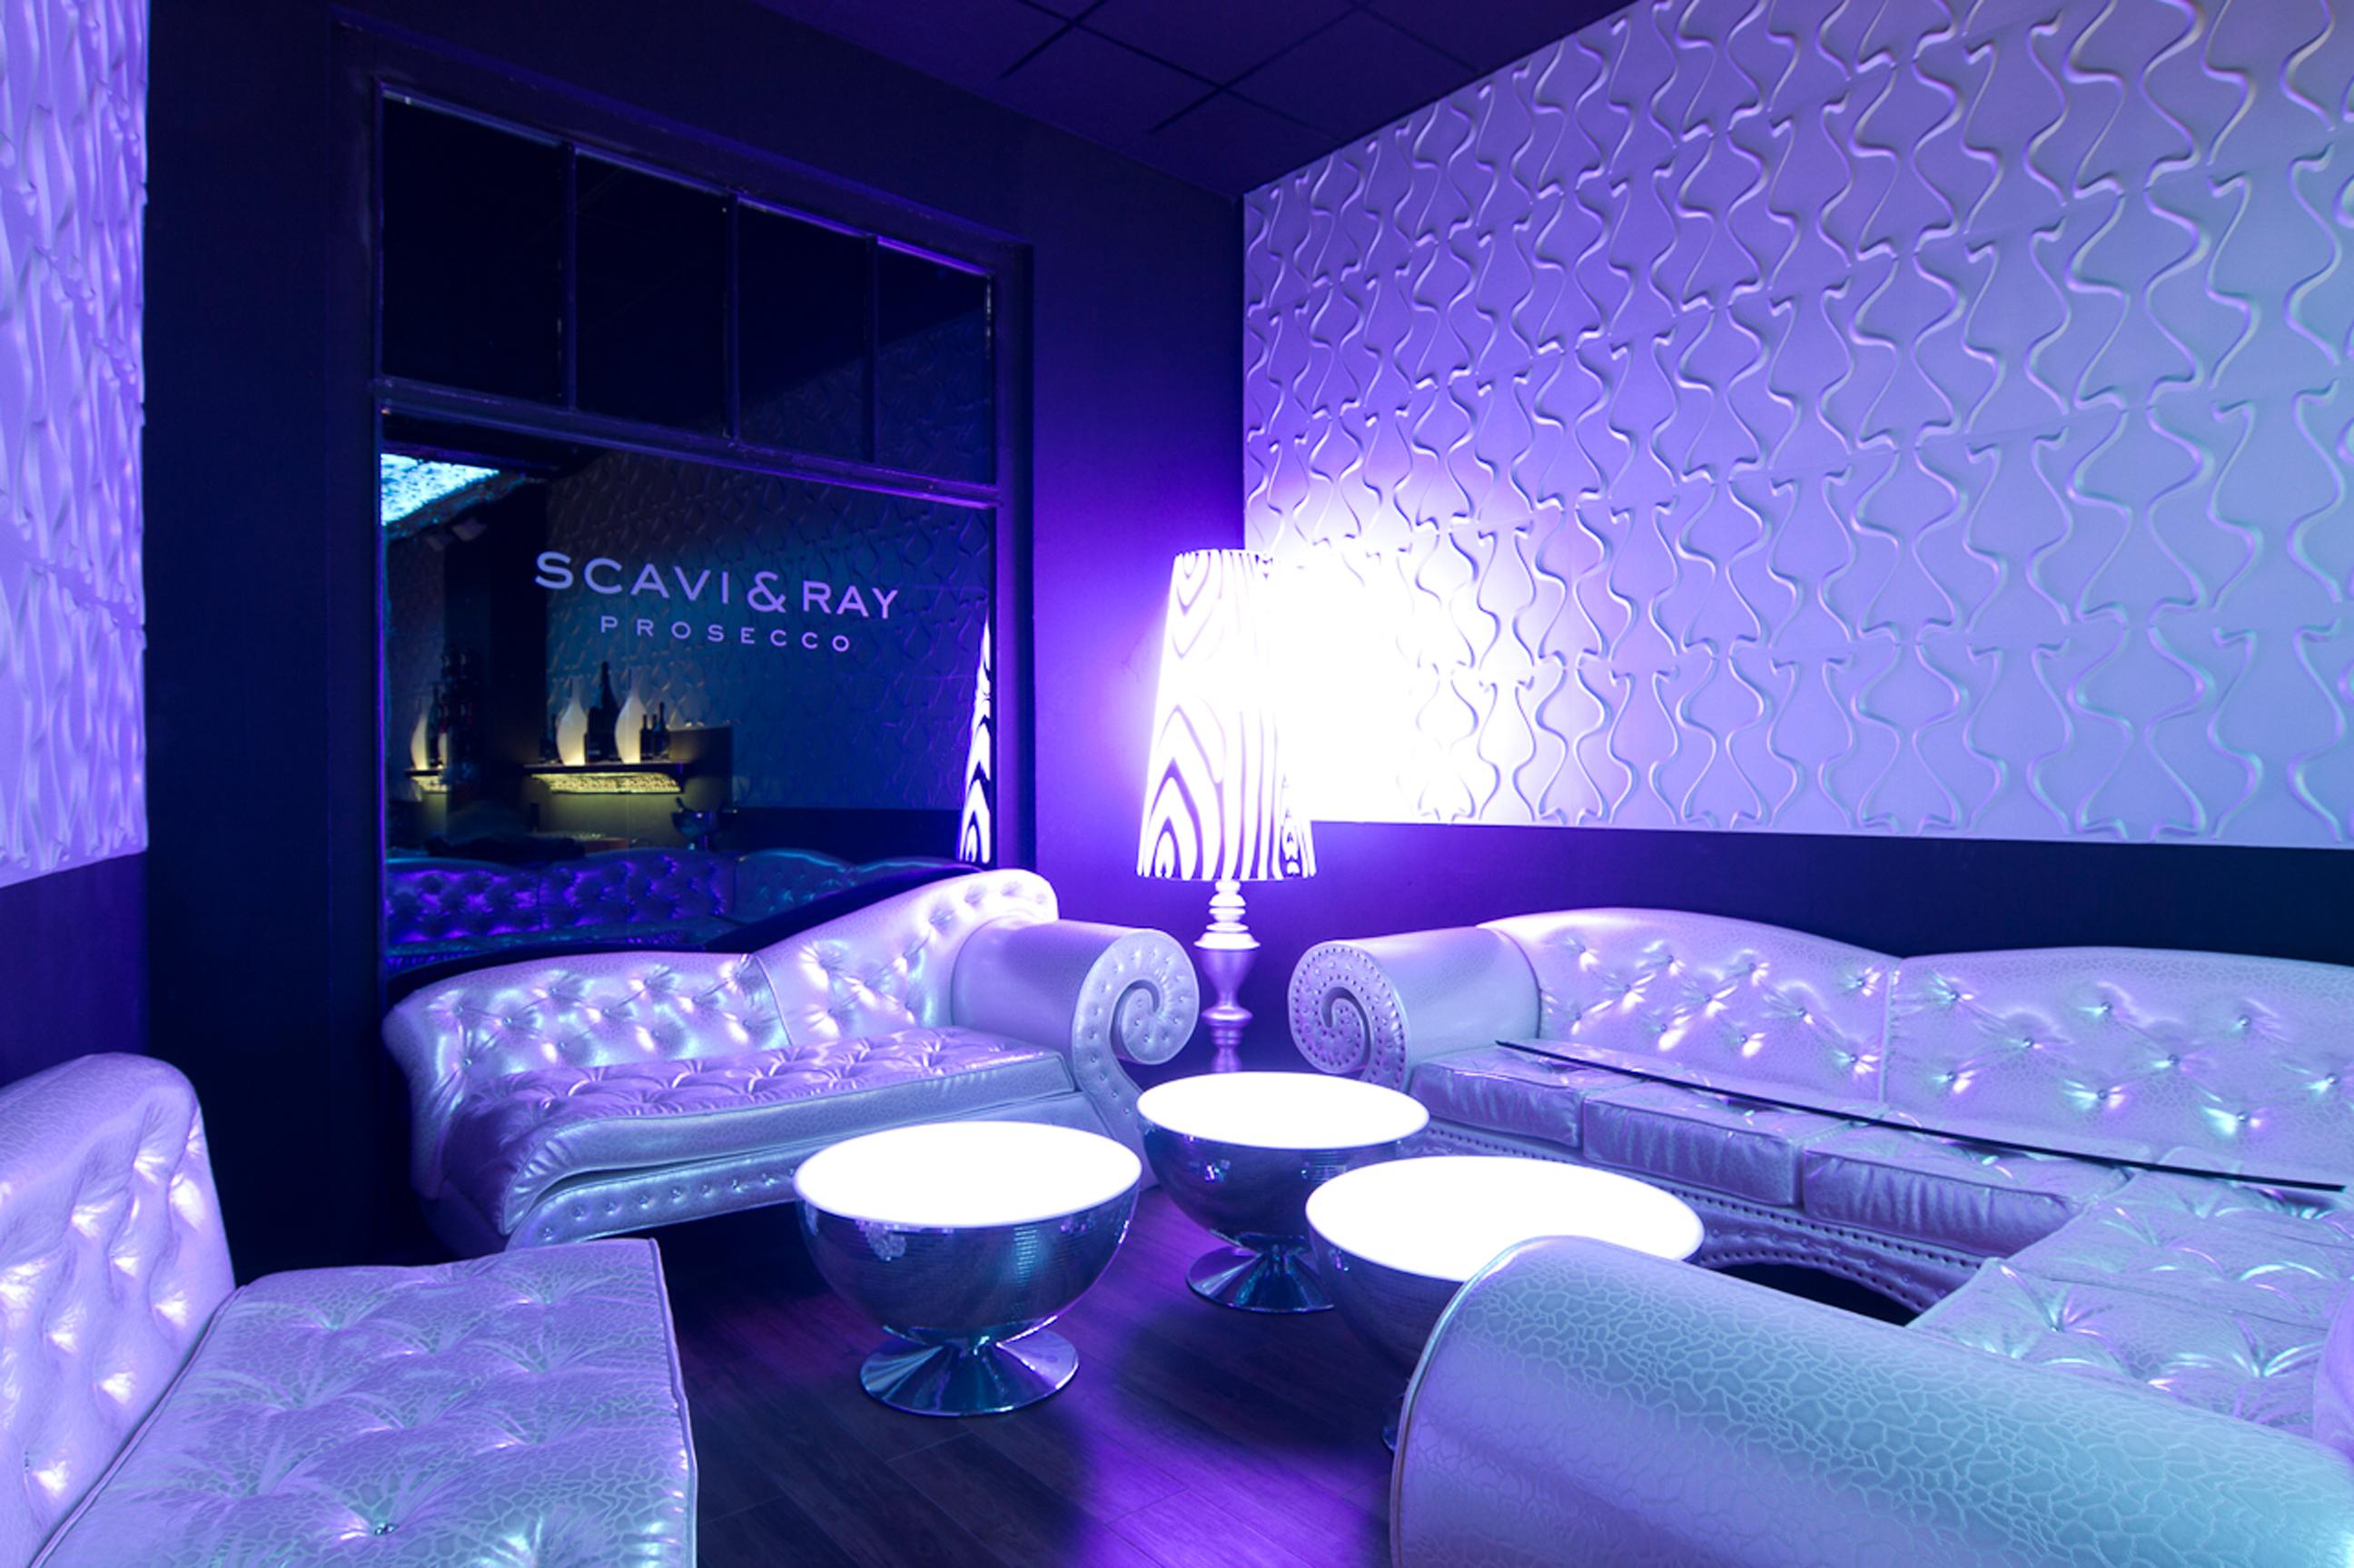 phoenix club 3d wandpaneele deckenpaneele. Black Bedroom Furniture Sets. Home Design Ideas